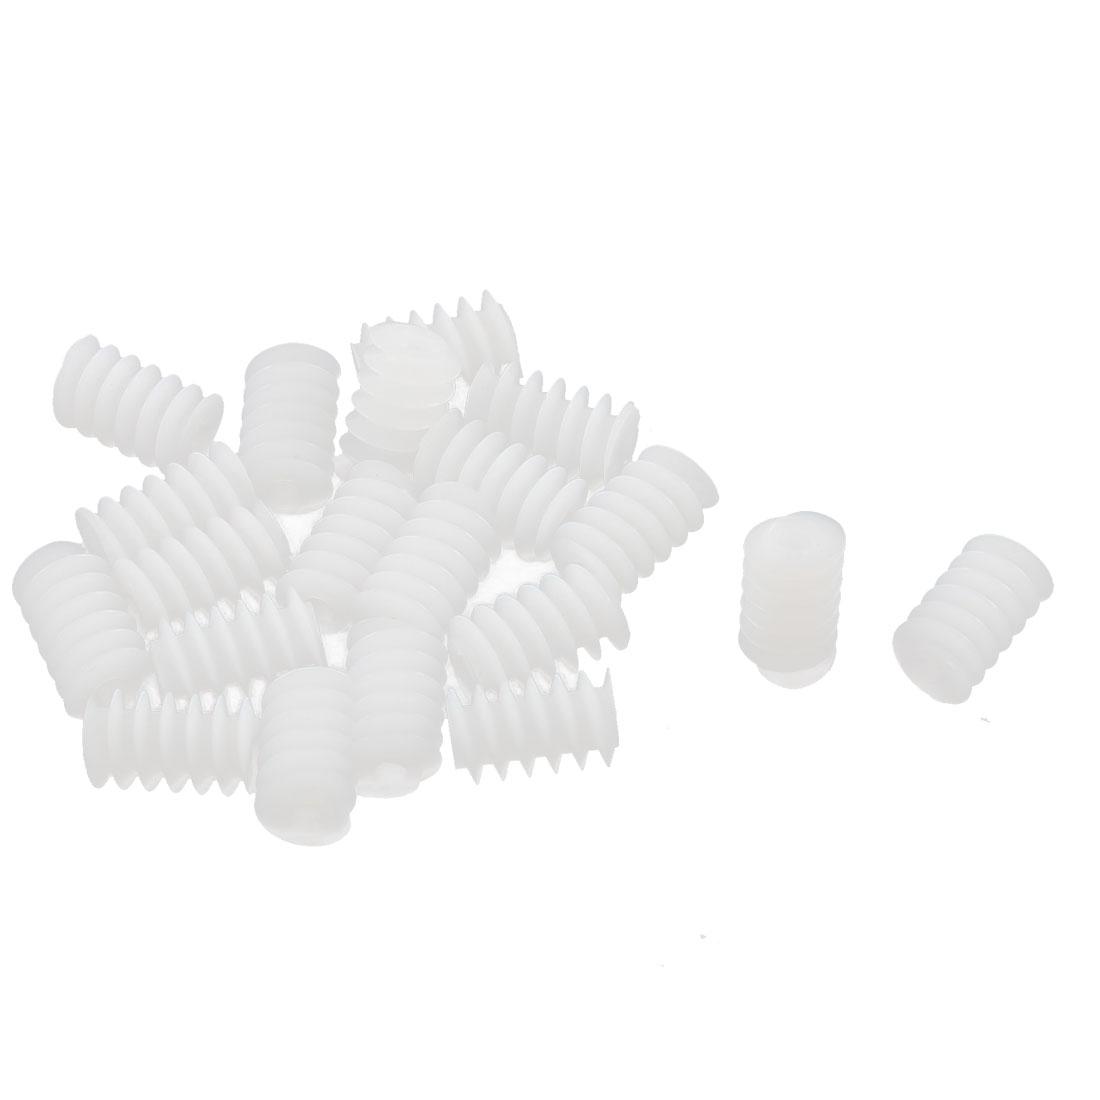 20Pcs 2mm Aperture Plastic Spur Gear 10mm x 6mm DIY Model Accessory